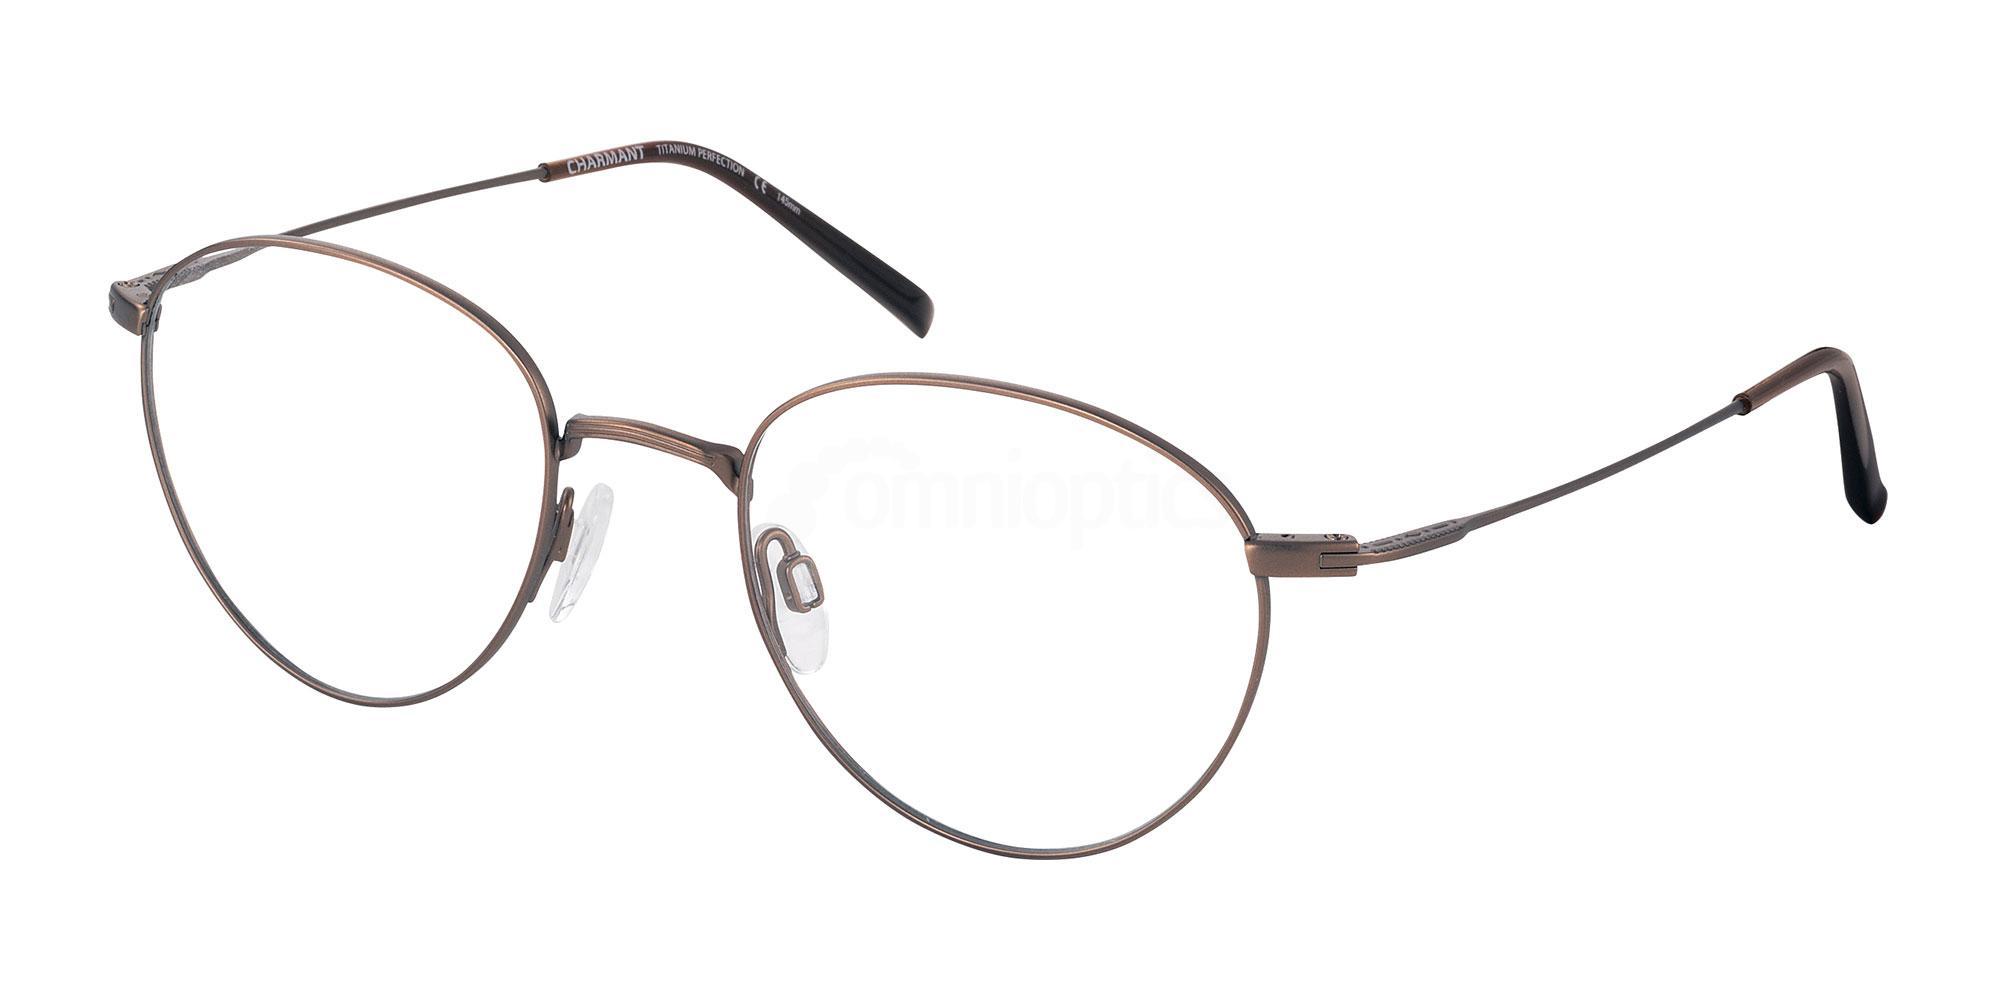 BR CH29707 Glasses, Charmant Titanium Perfection